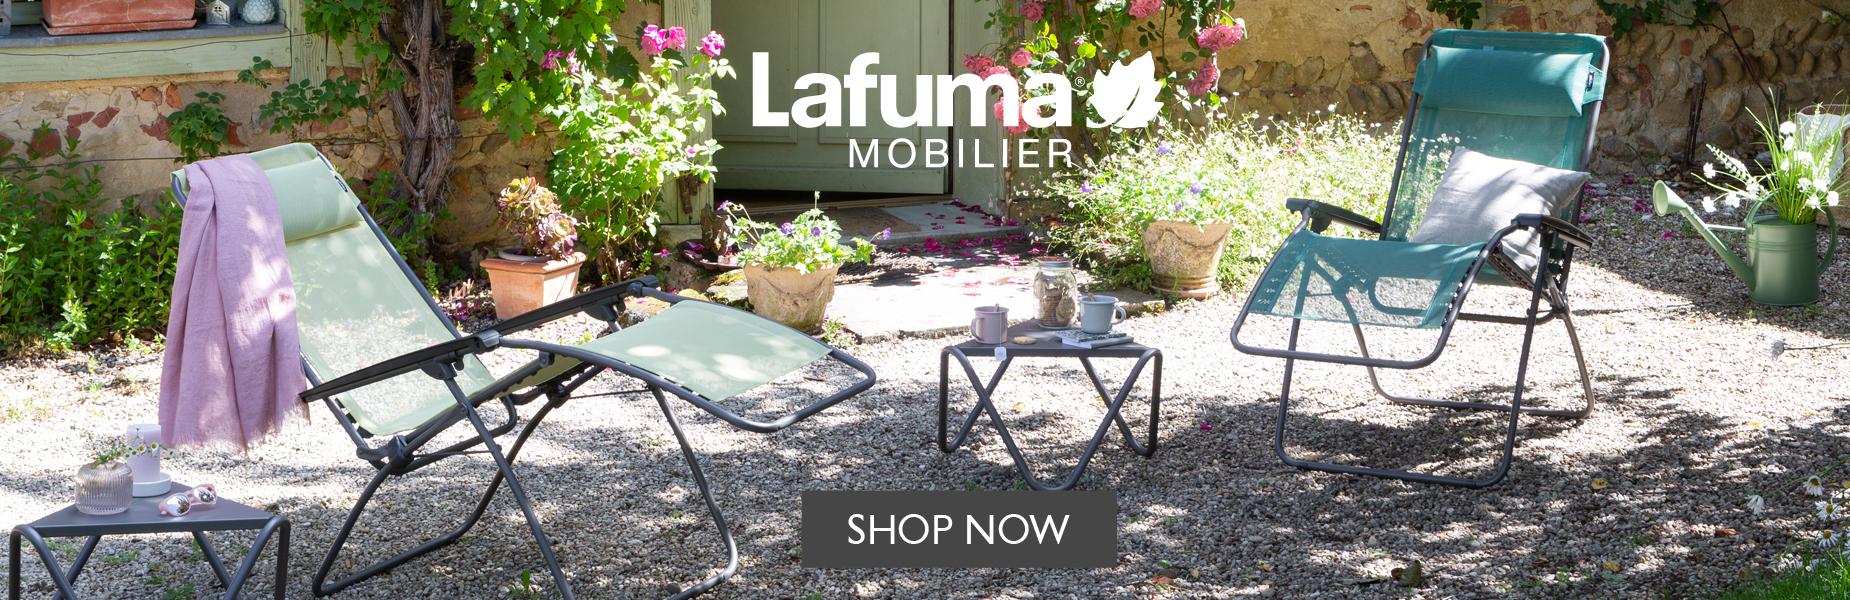 Lafuma Garden Furniture | Shop Now